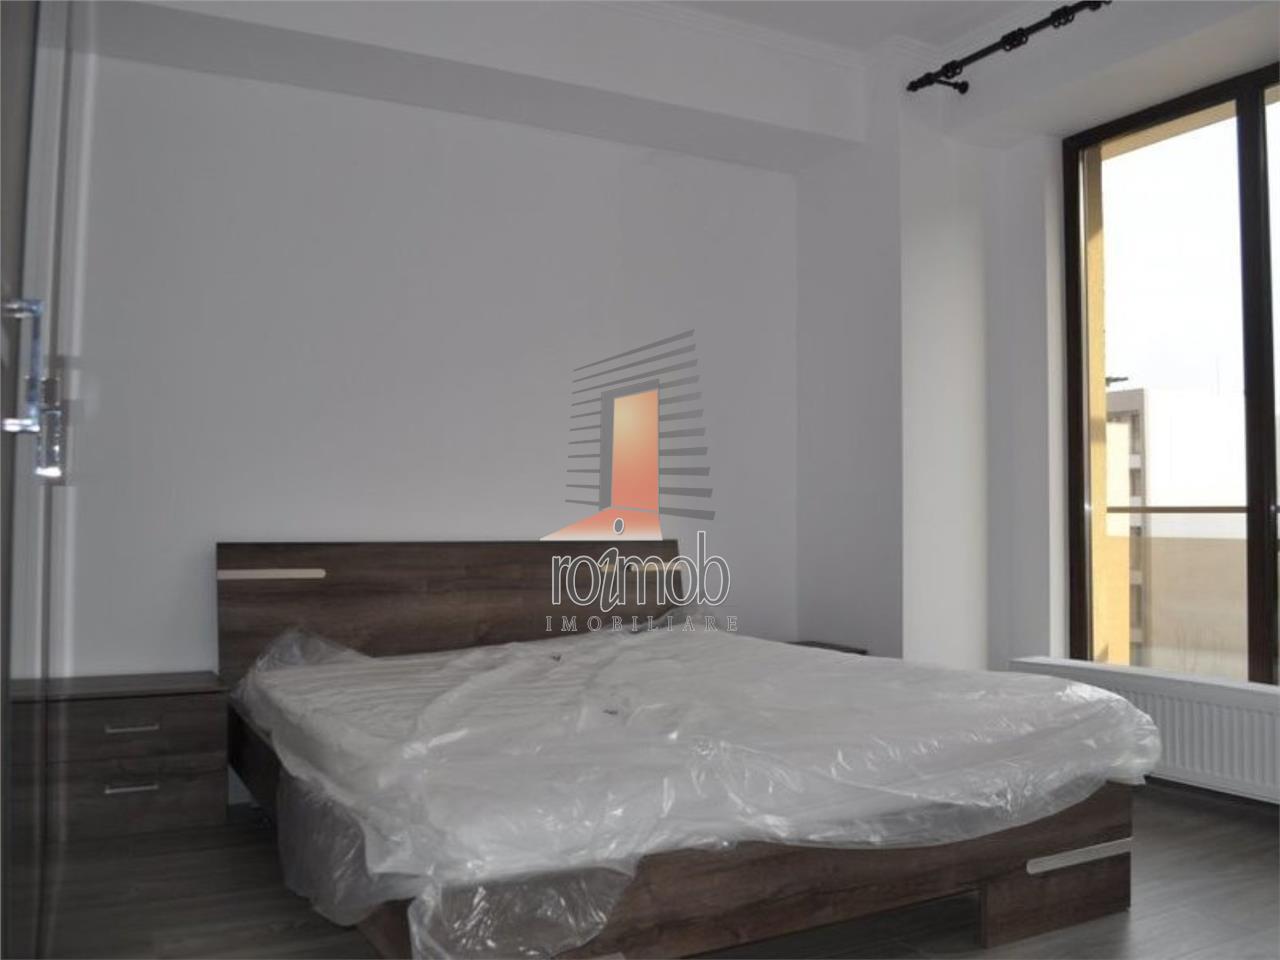 Baneasa Medicover apartament 3 camere mobilat utilat parcare subterana